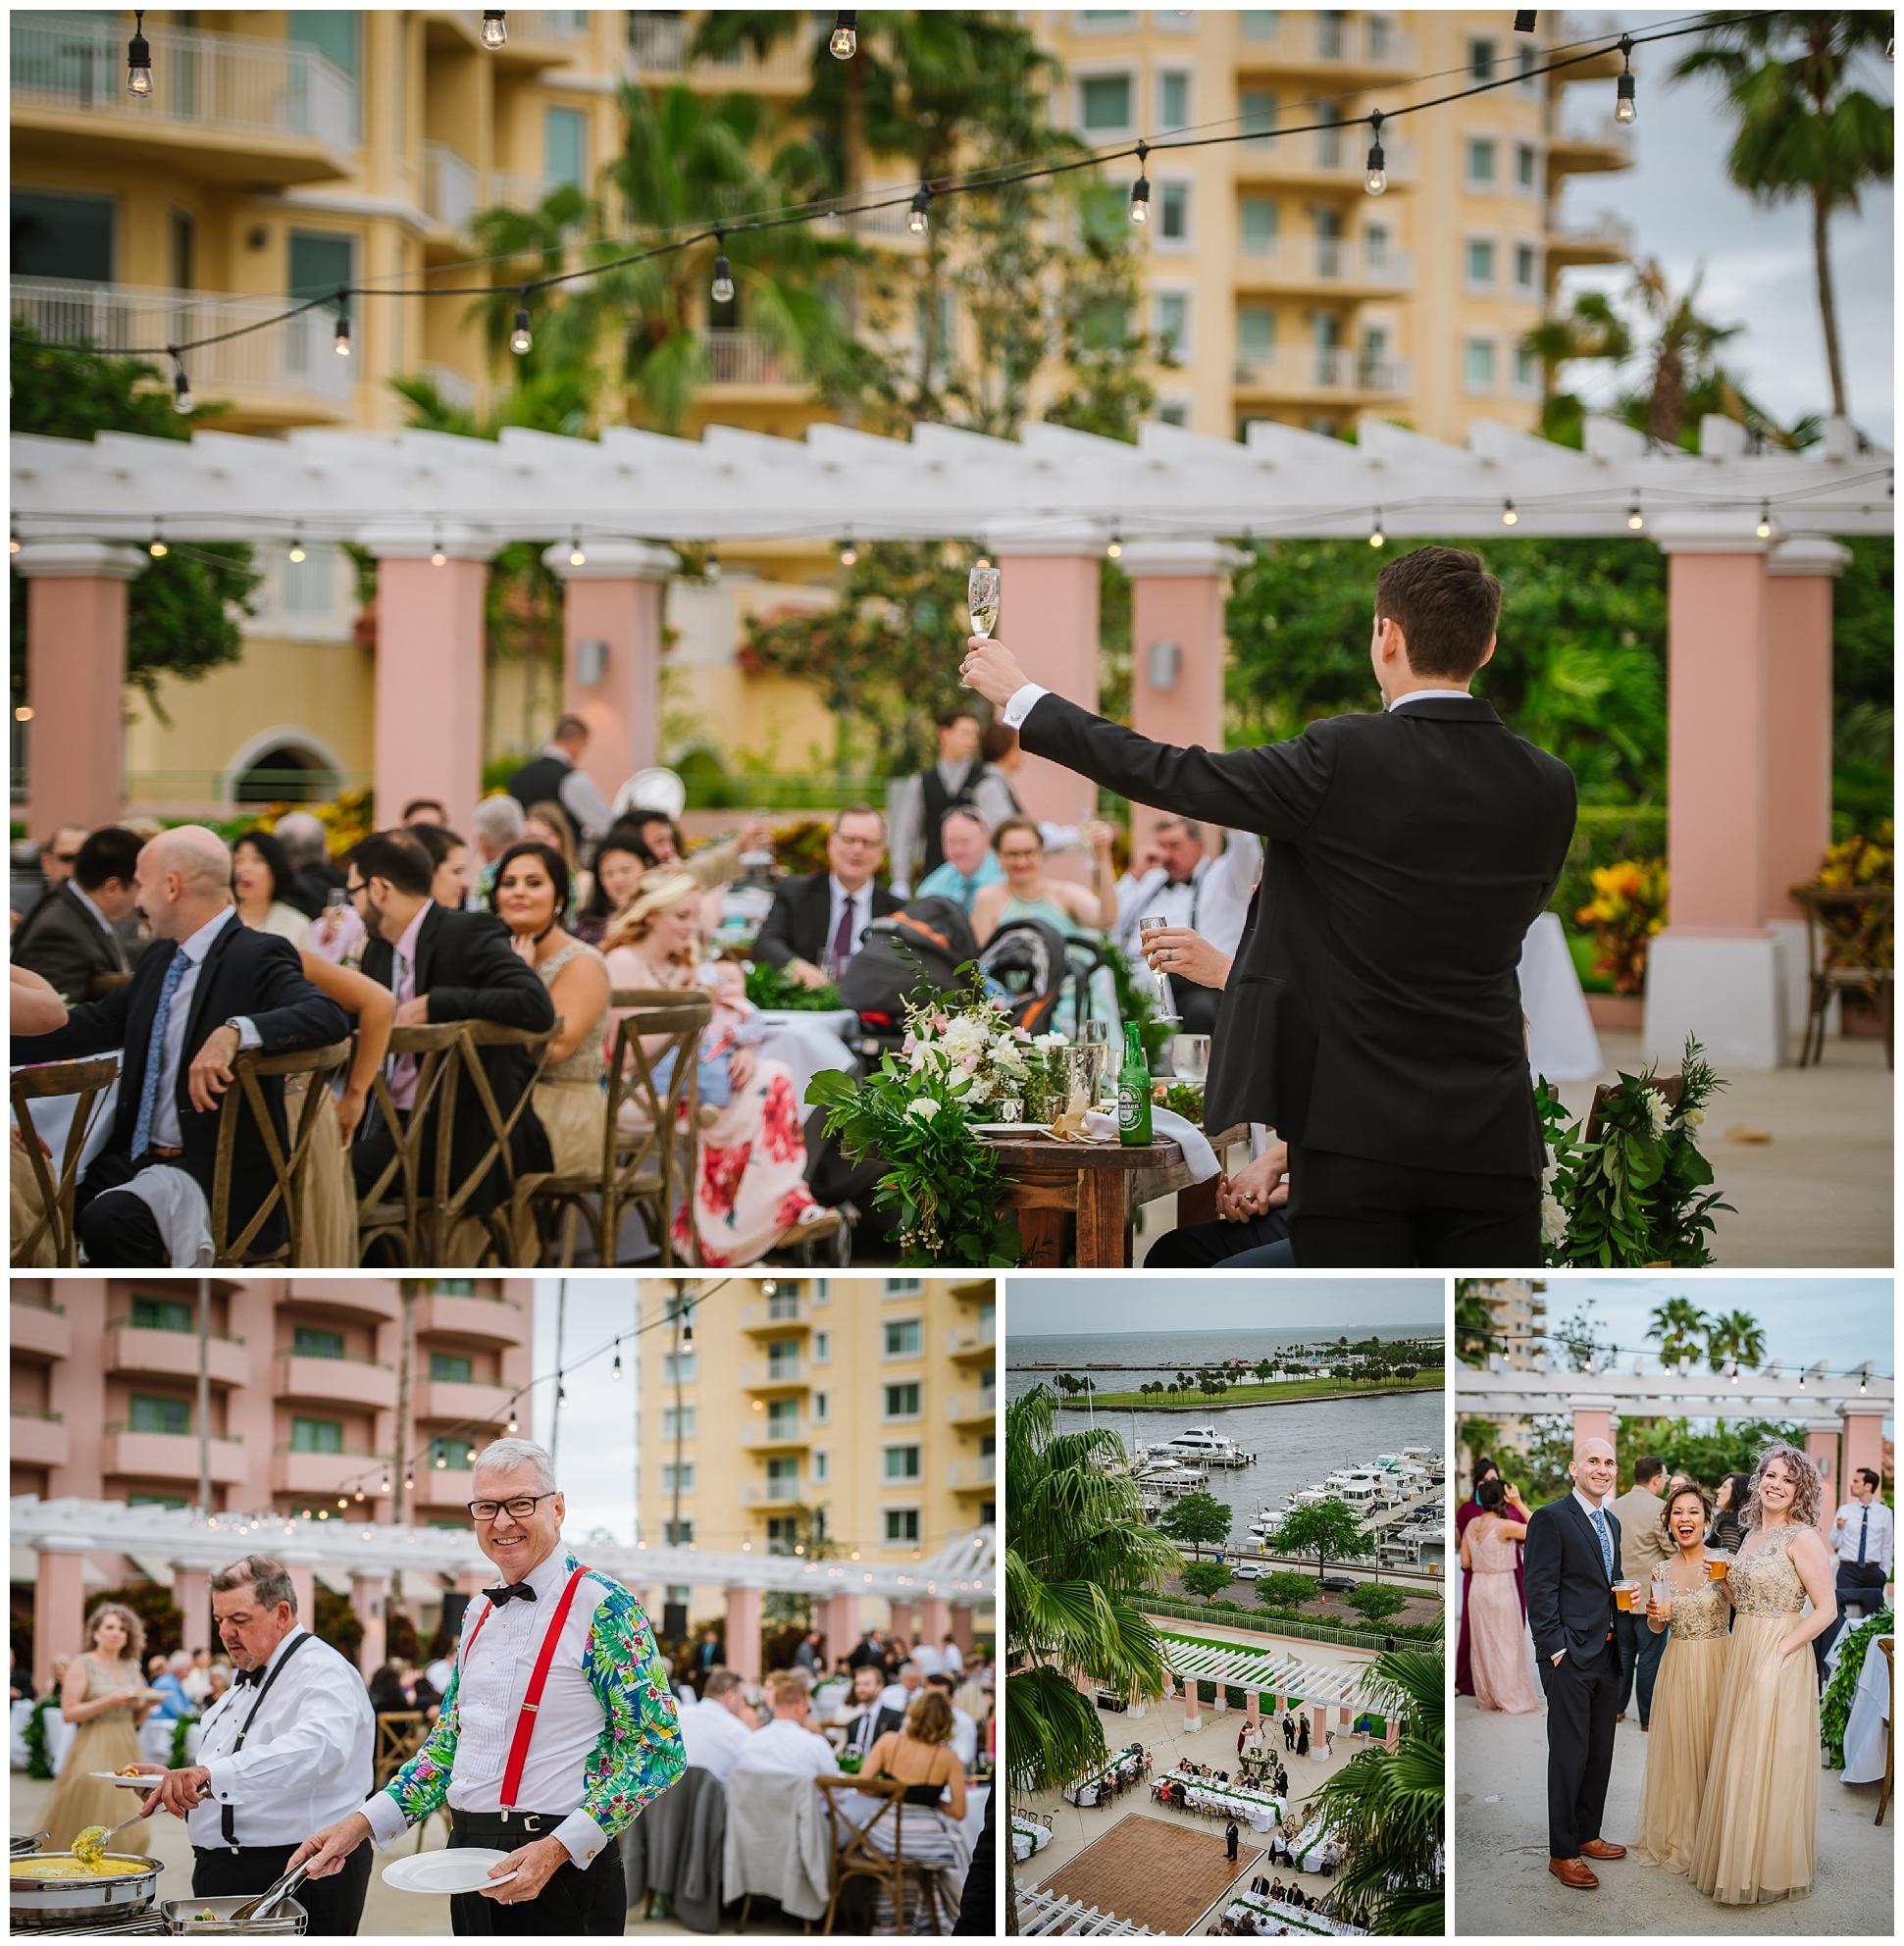 st-pete-wedding-photographer-italian-romance-theme-rustic-flower-crown_0443.jpg